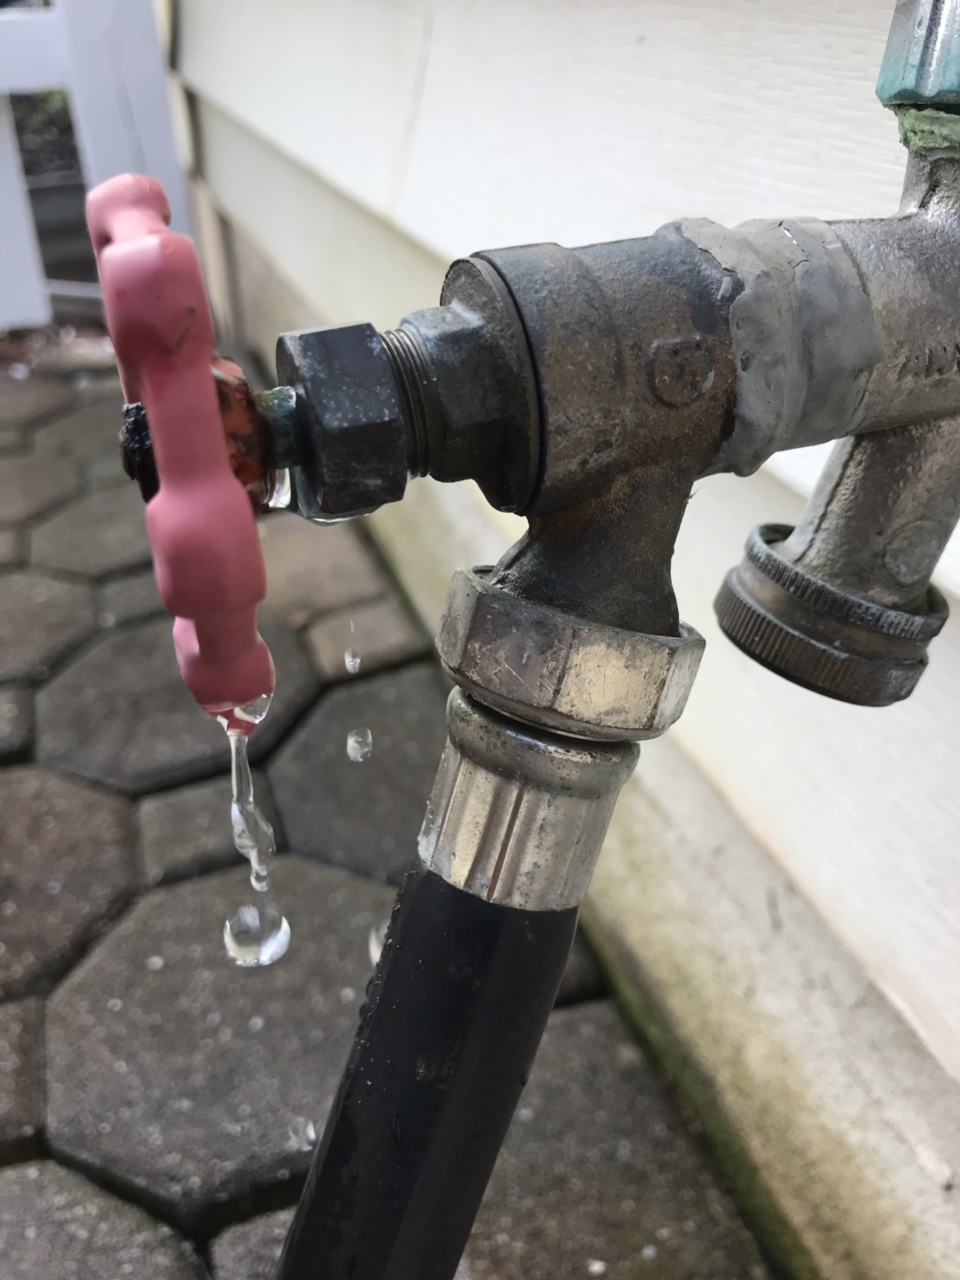 Spigot Leaking From Knob